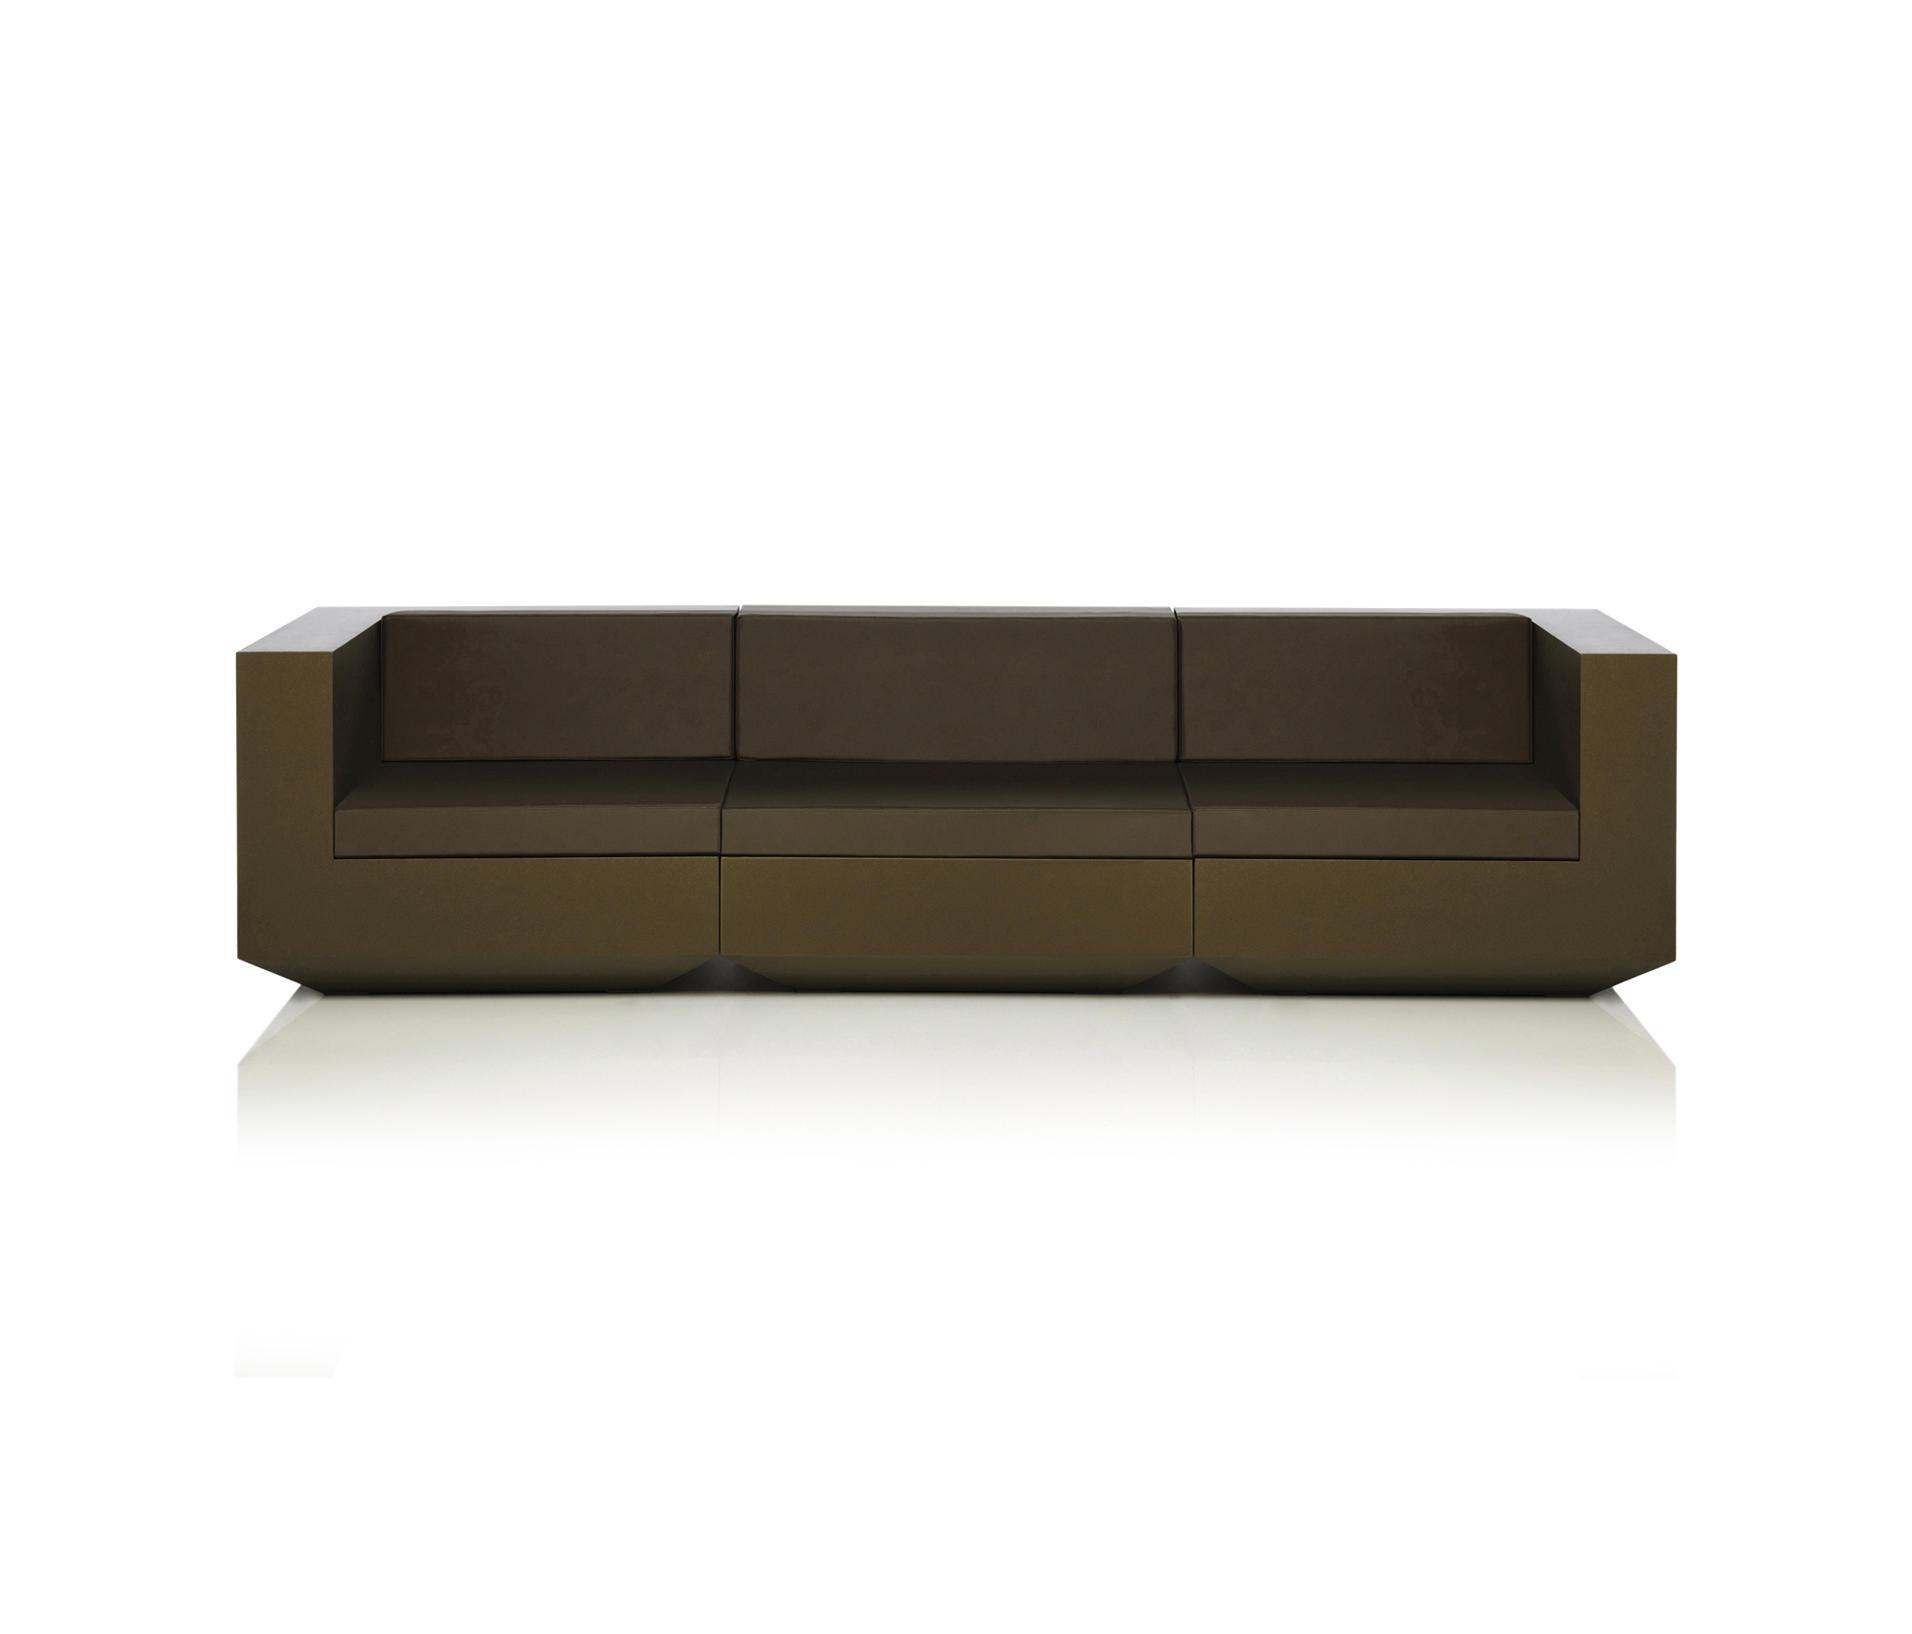 Vela sofa modular sof s de jard n de vondom architonic for Sofa modular jardin